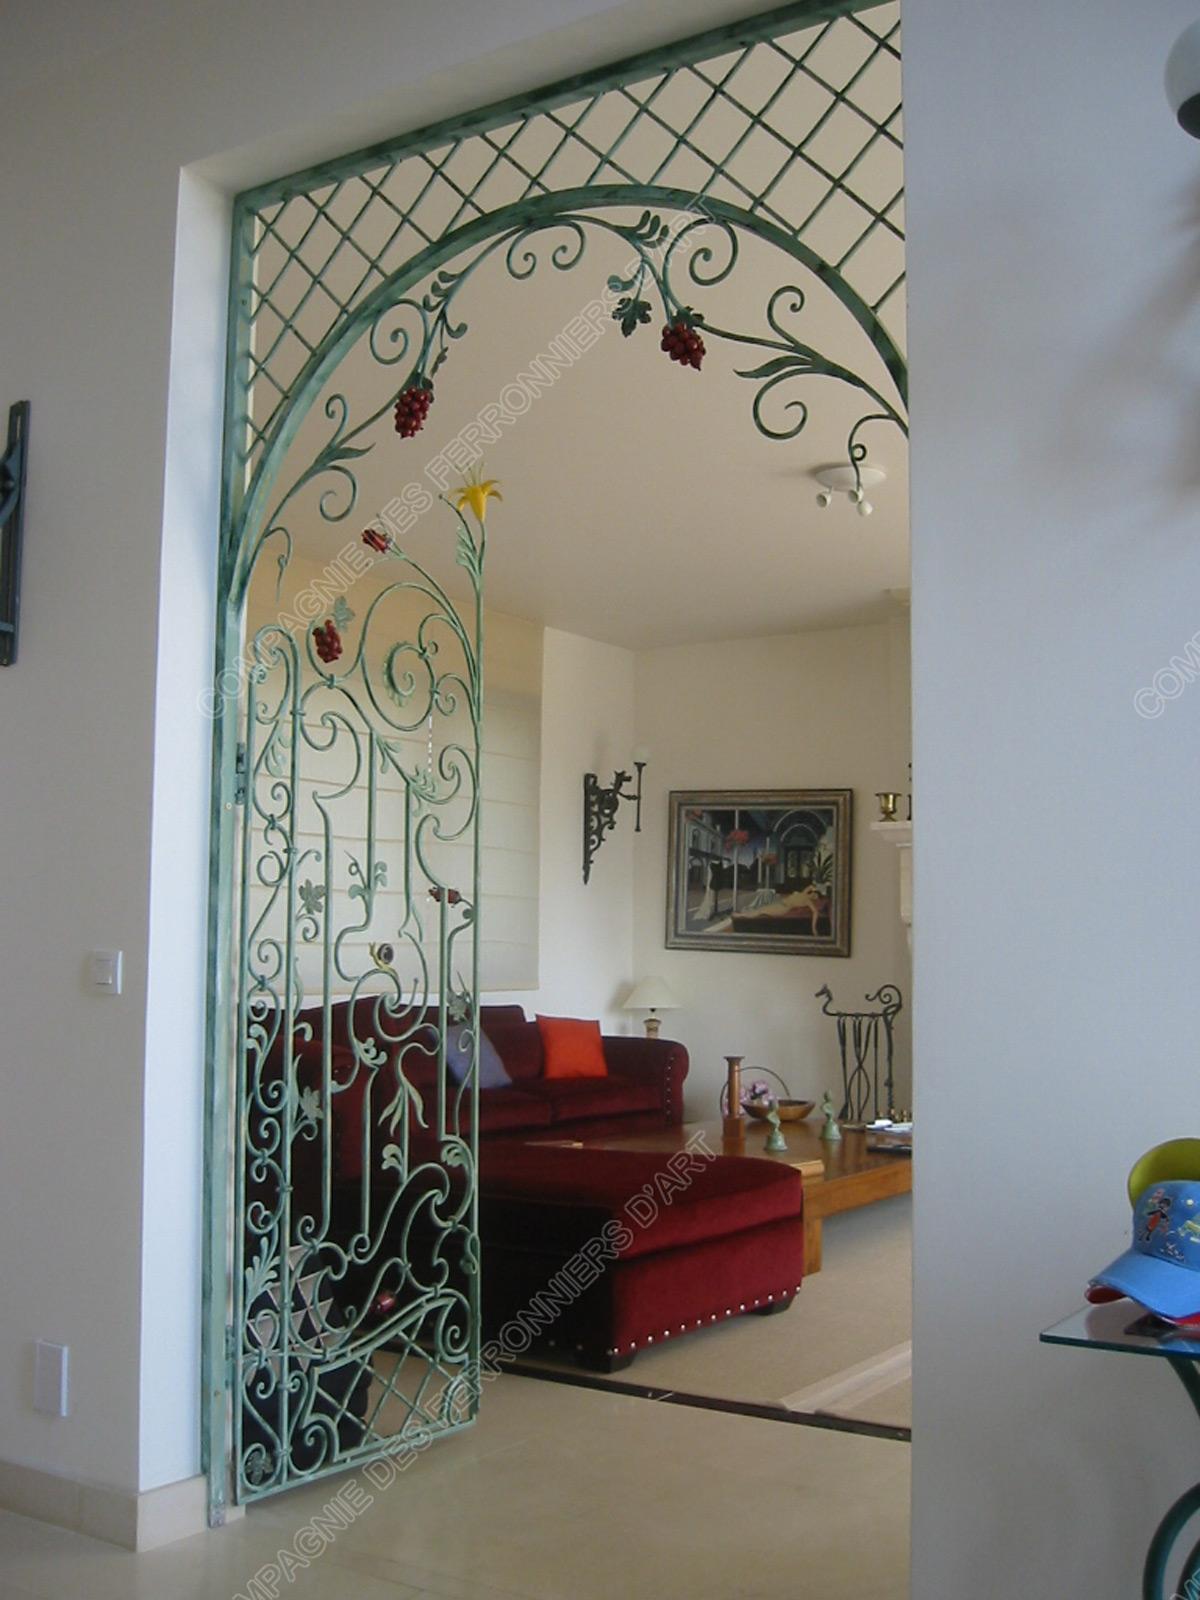 Grilles en fer forg d coratives mod le gor05 baroque for Porte decorative